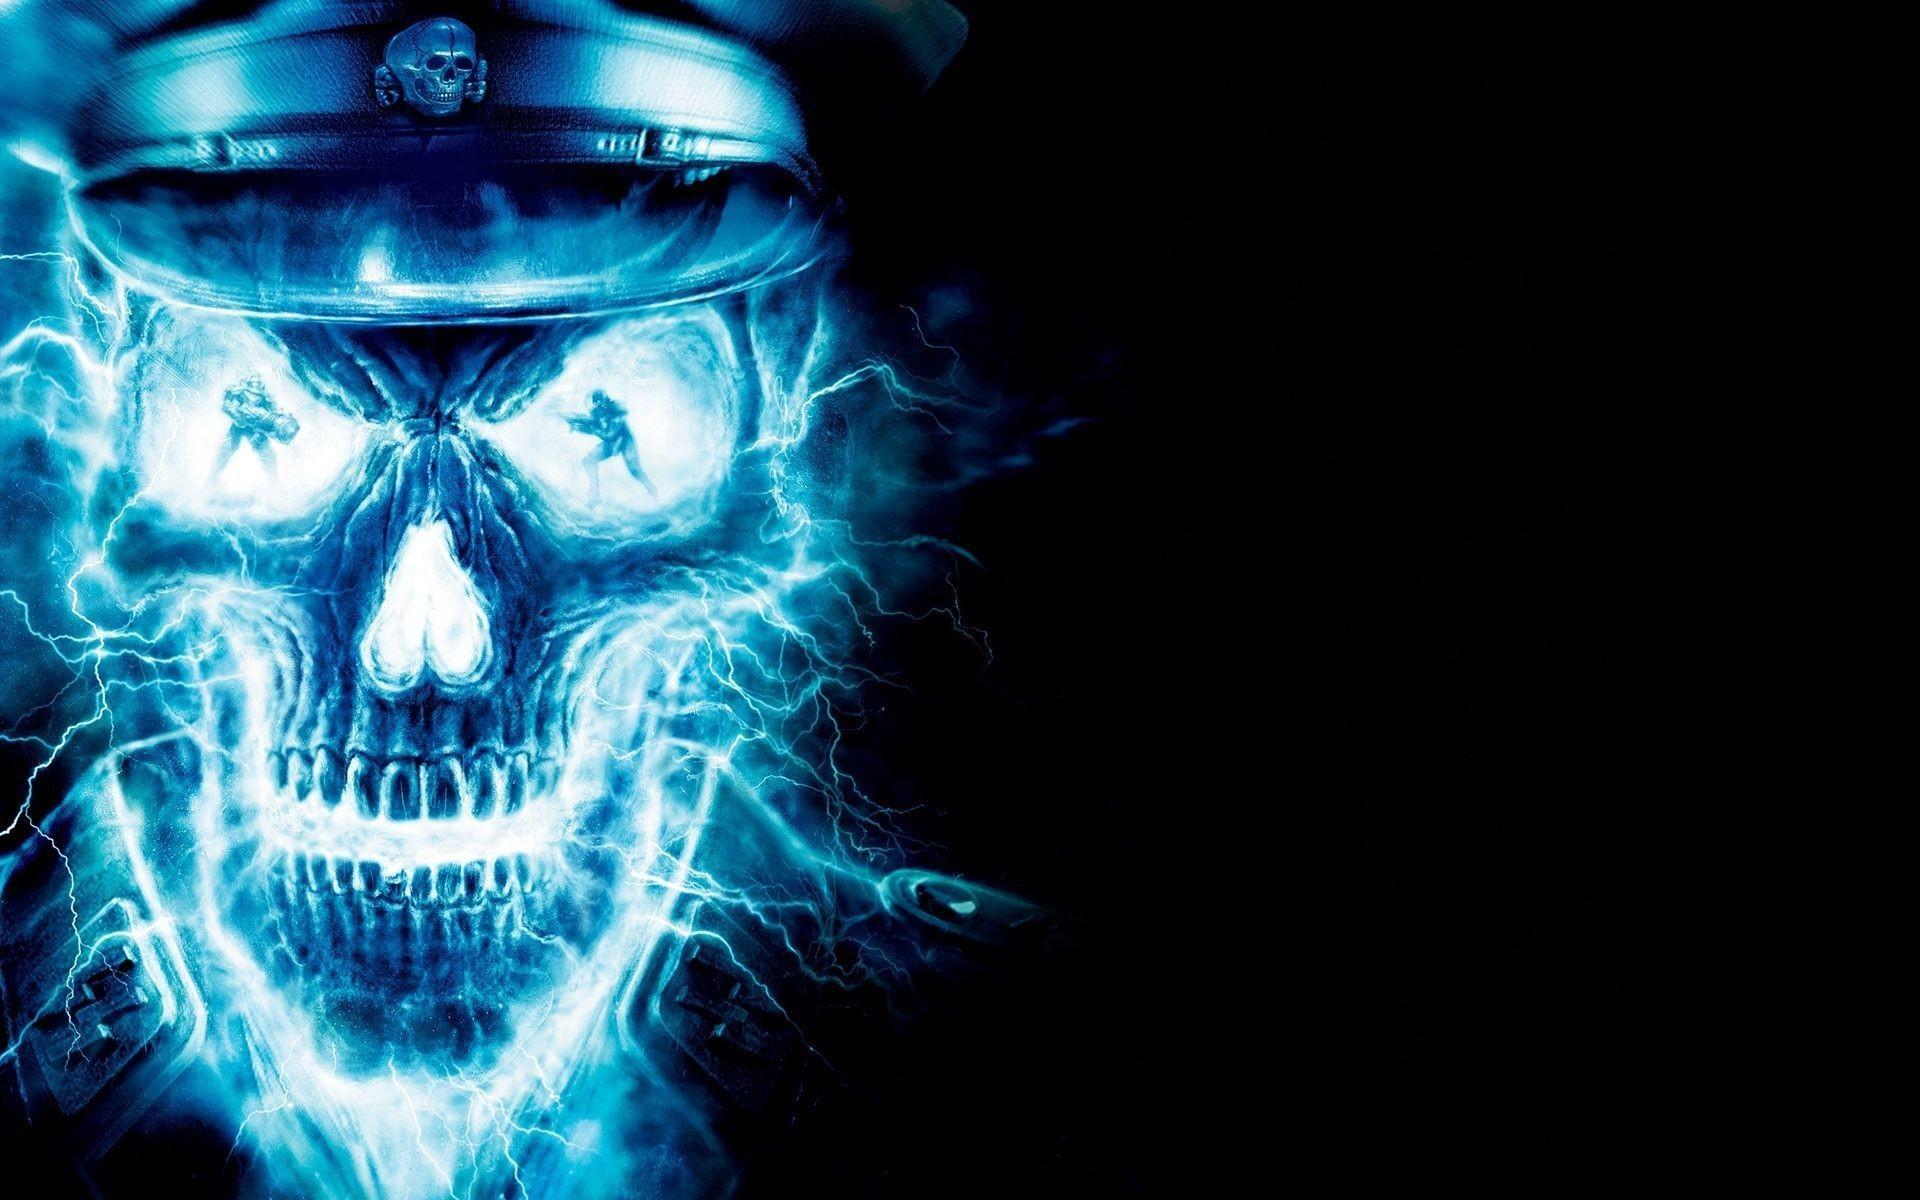 Skull Wallpaper Awesome Images adsro Yoanu